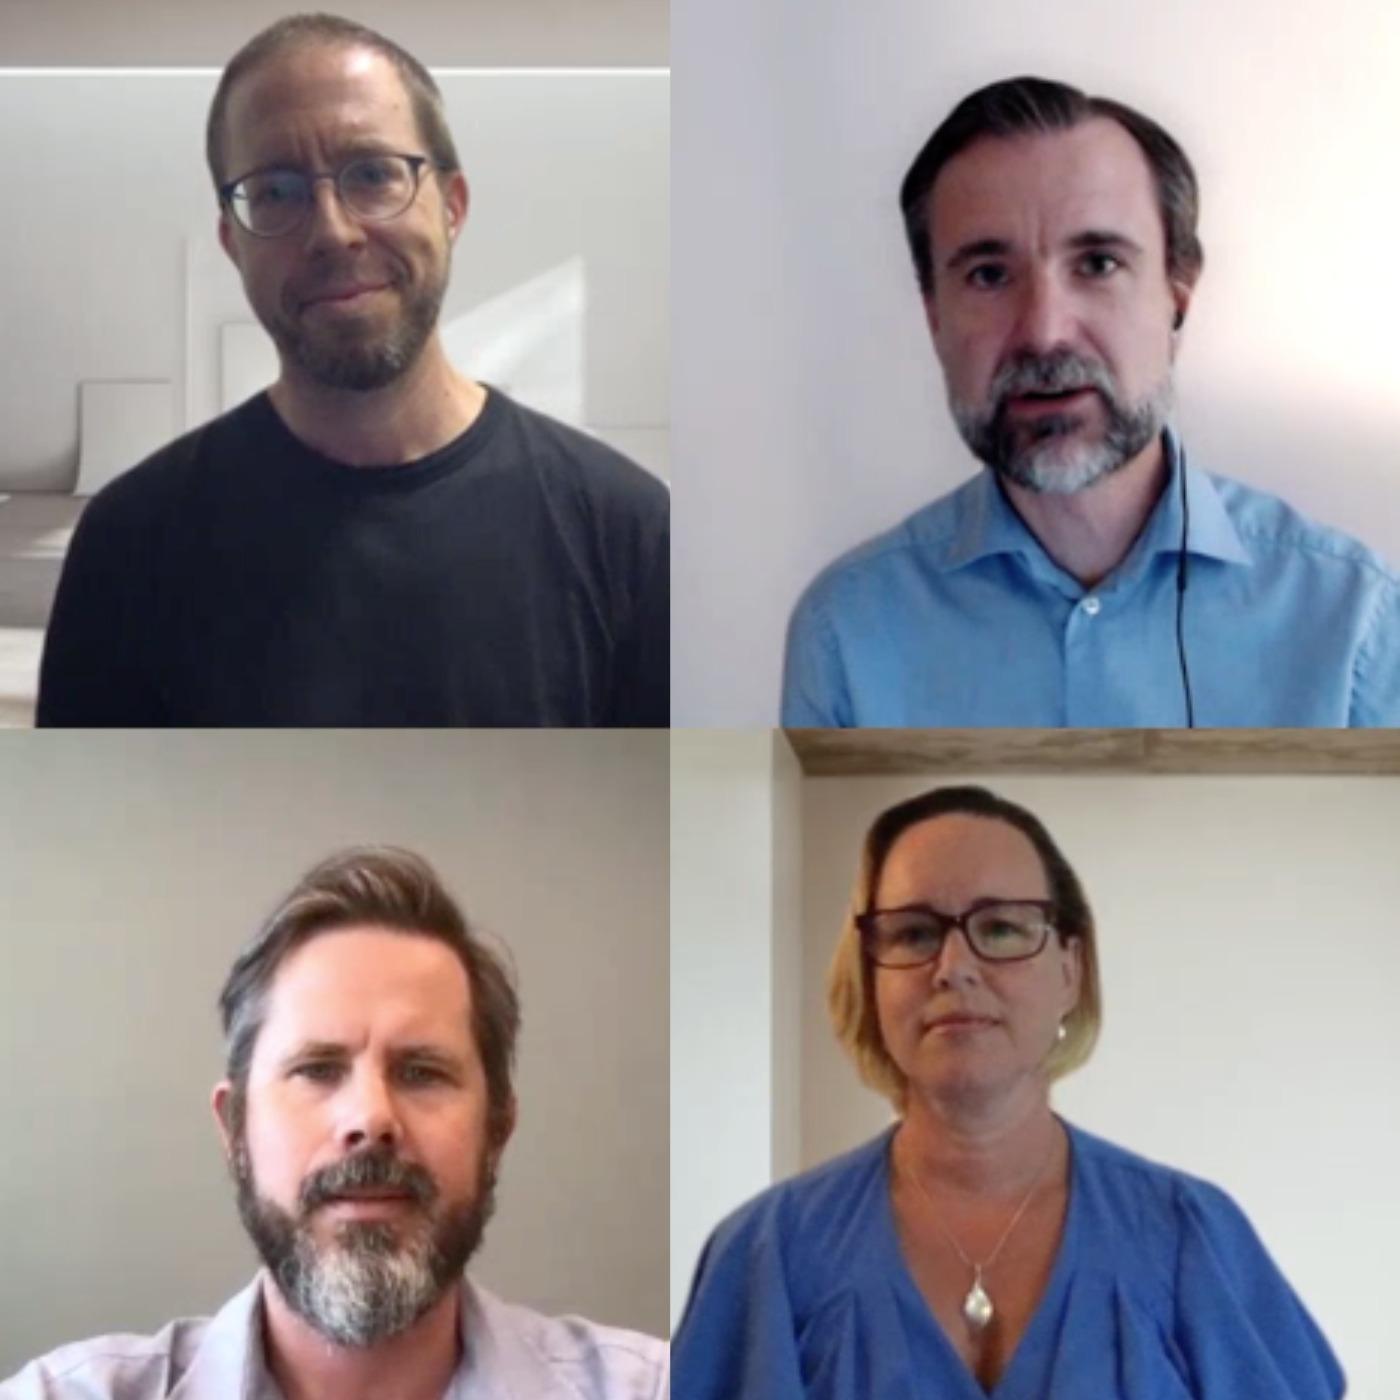 TEMA: Pandemins påverkan på digitaliseringen (#134)